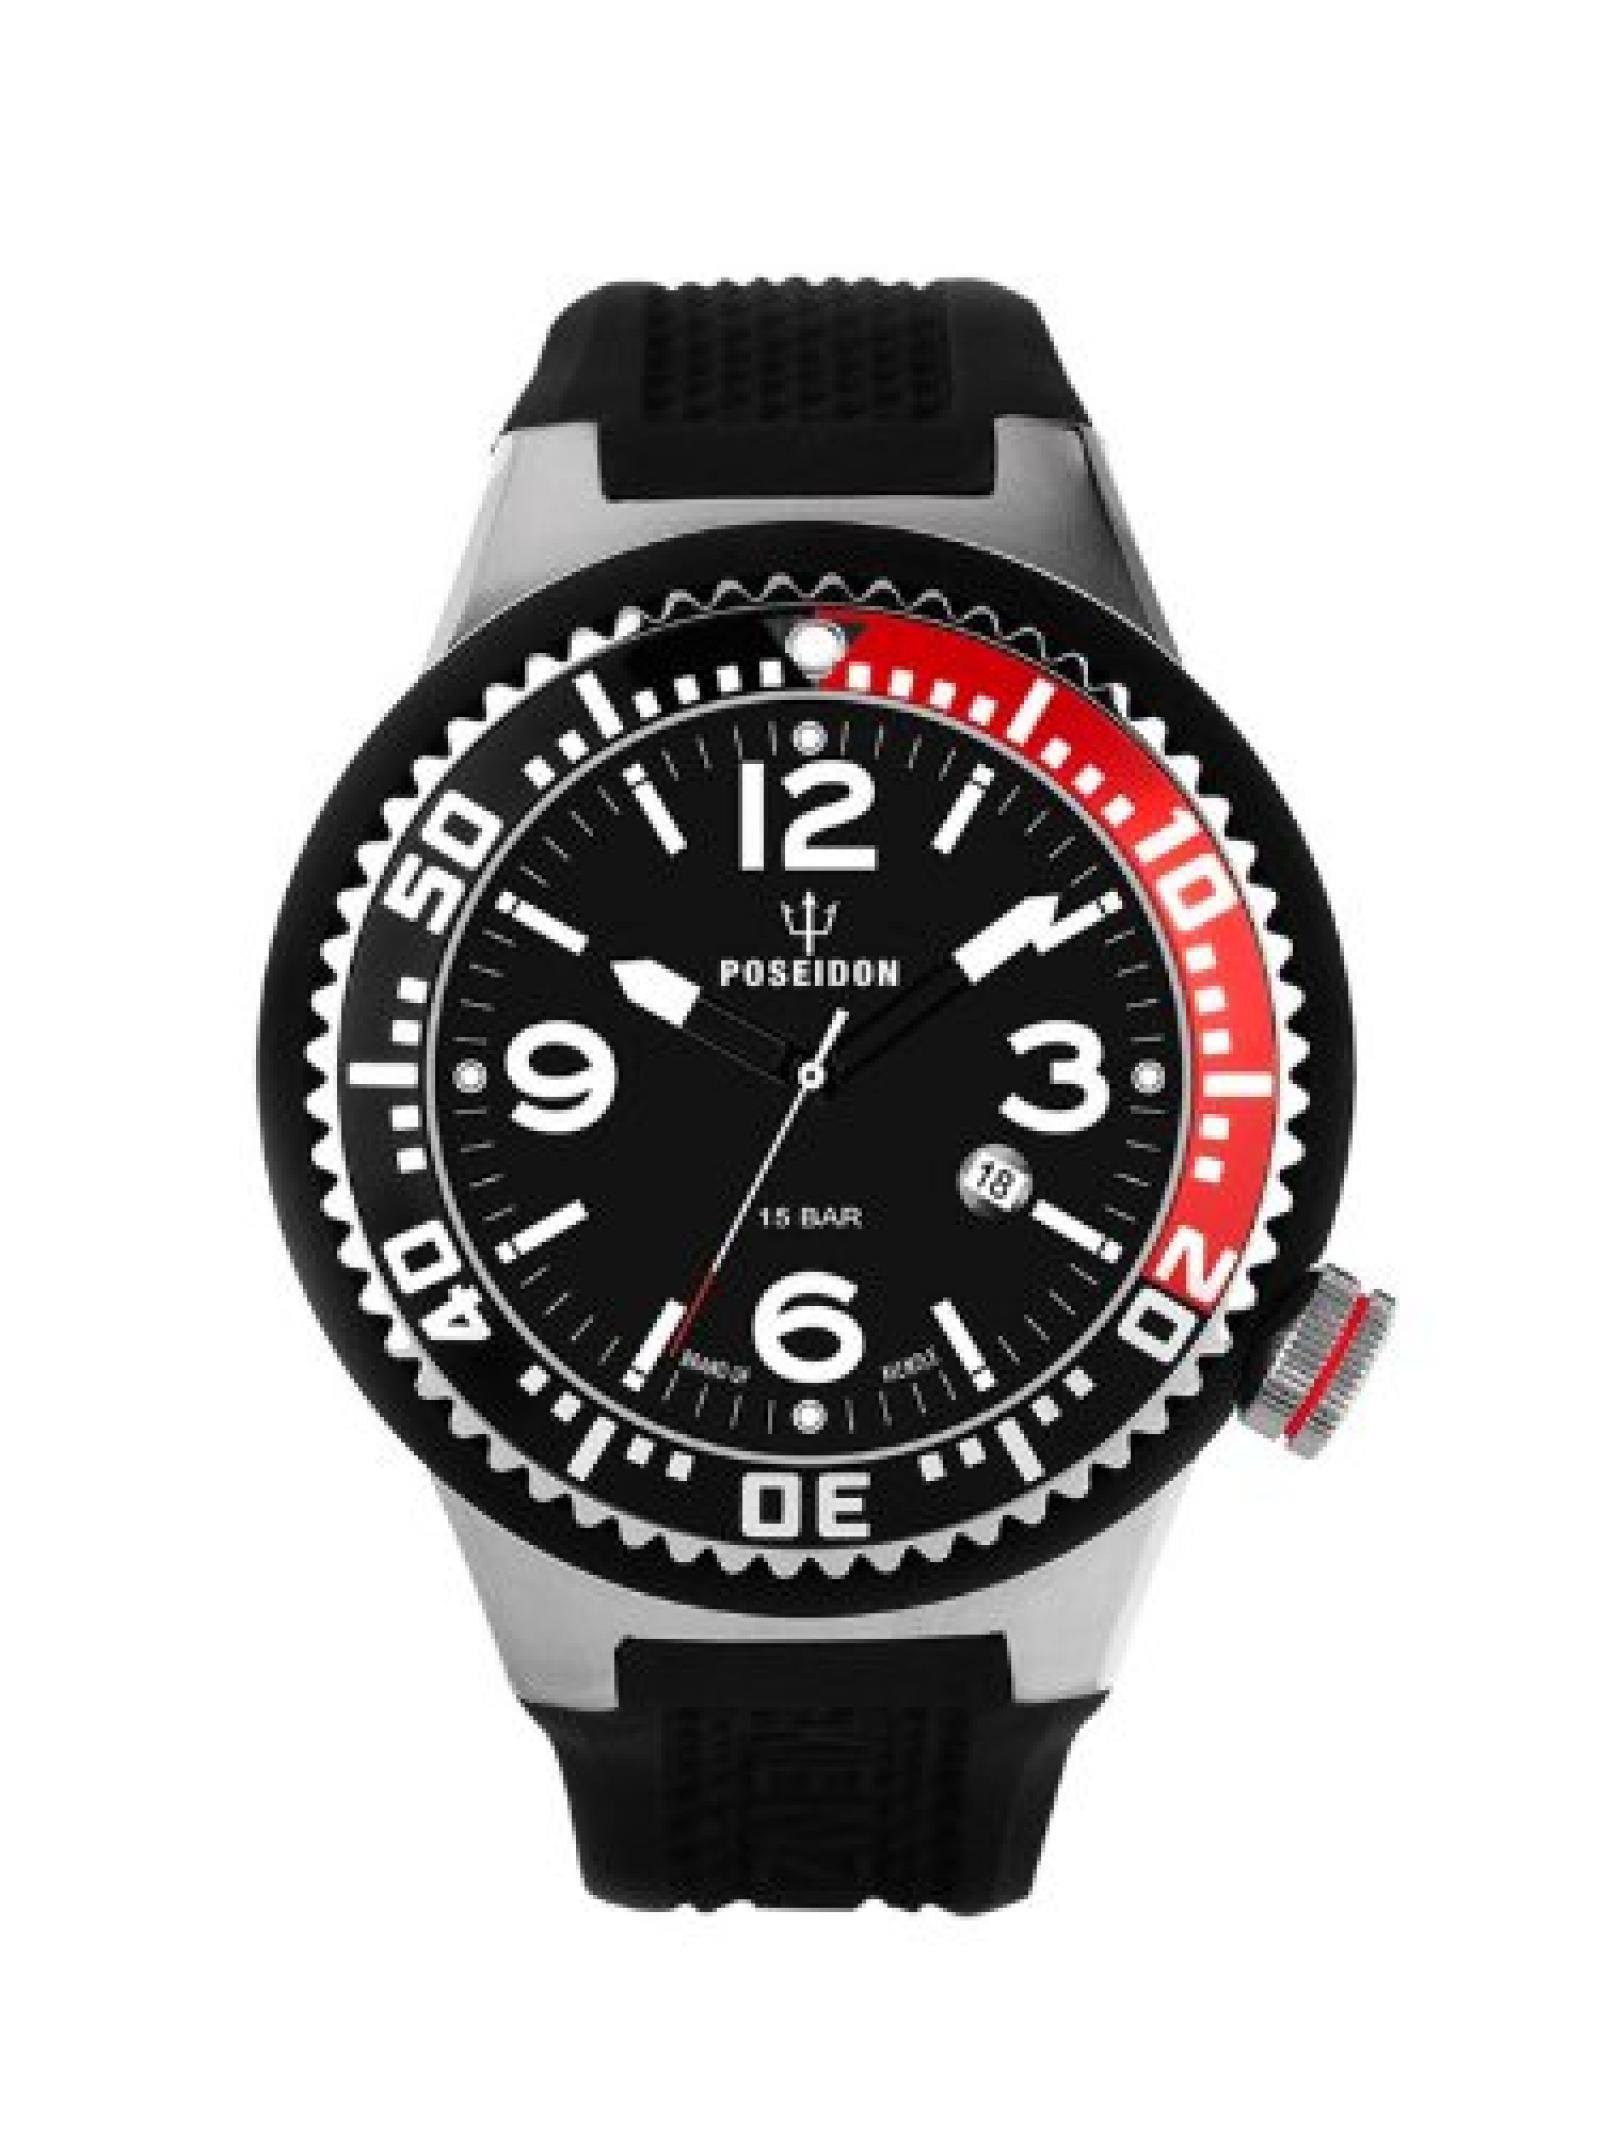 Kienzle Herren-Armbanduhr POSEIDON L Analog Quarz Silikon K2093013053-00401